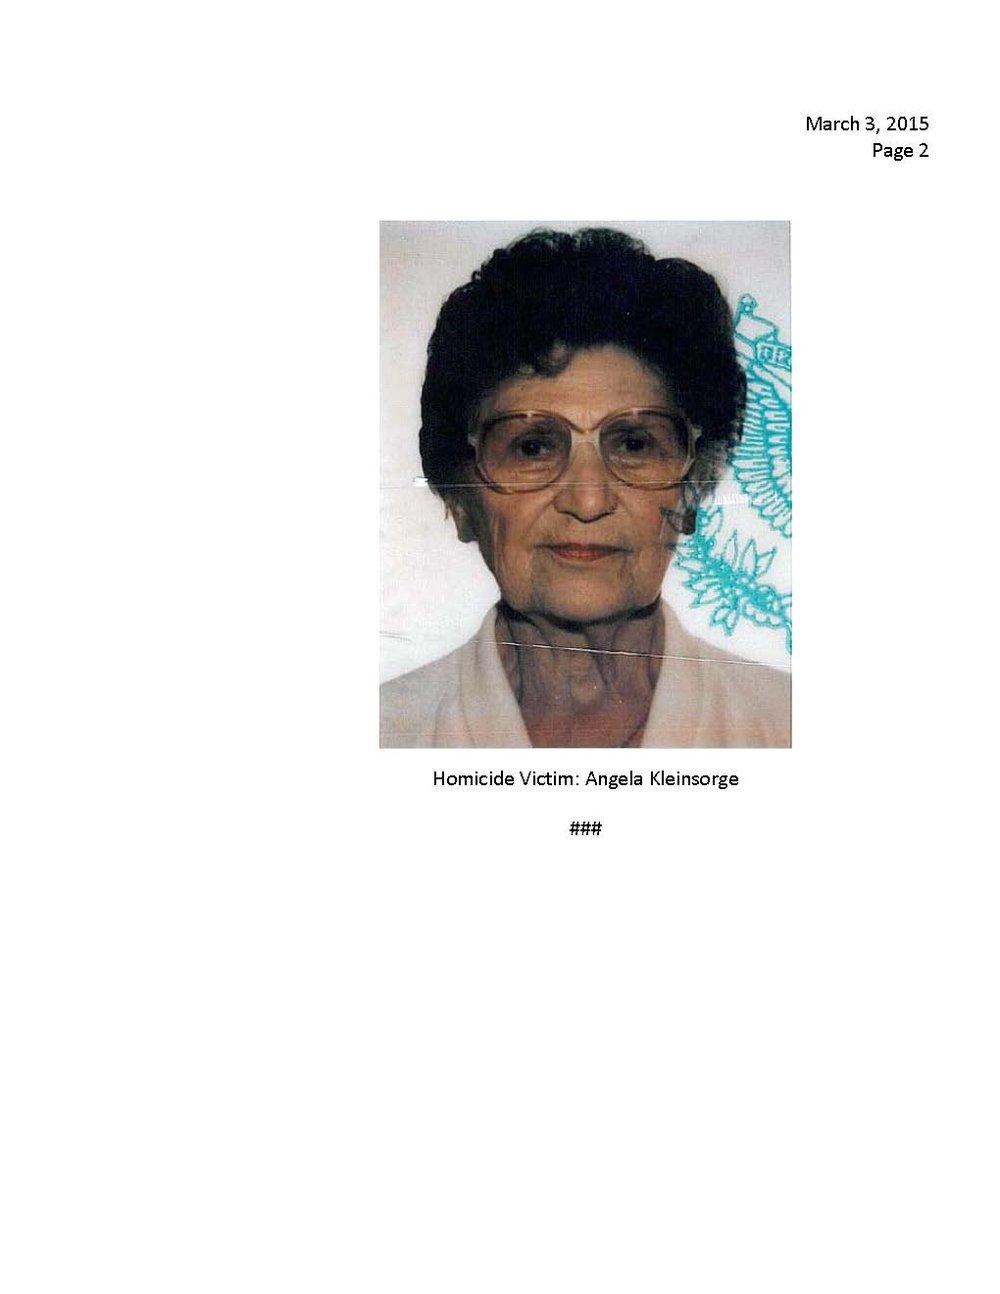 030315 Angela Kleinsorge Homicide - 23 year anniversary_Page_2